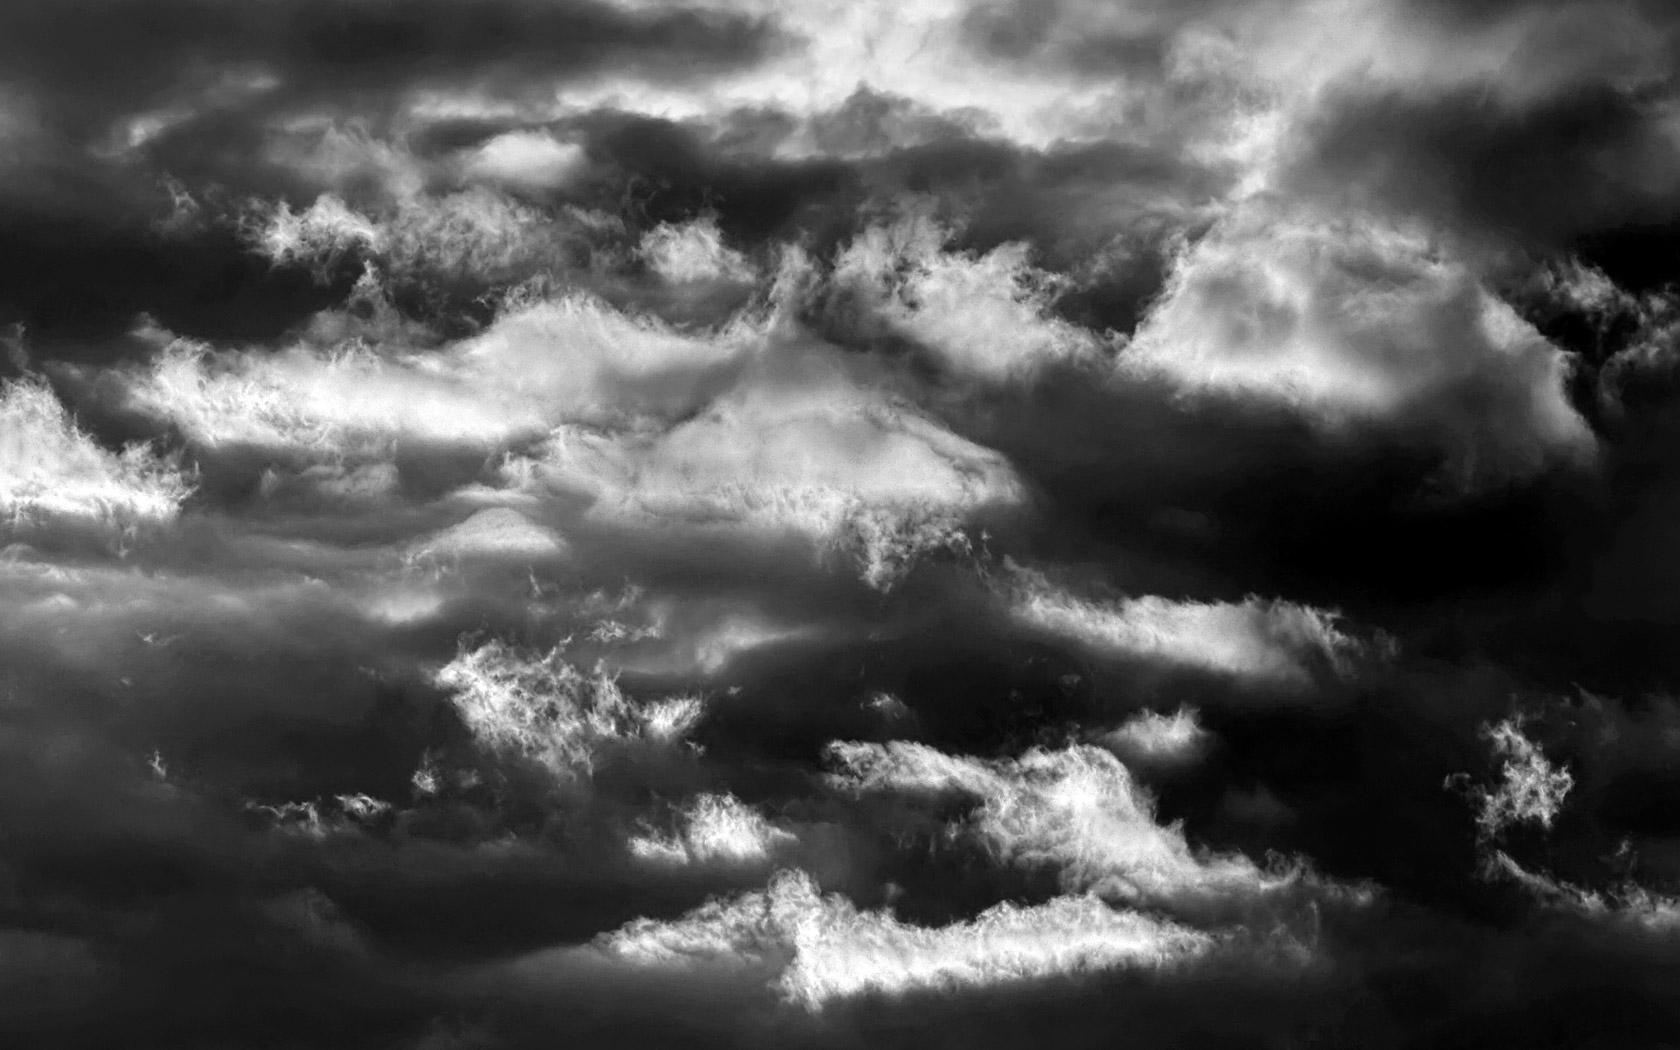 ocean-storm-clouds